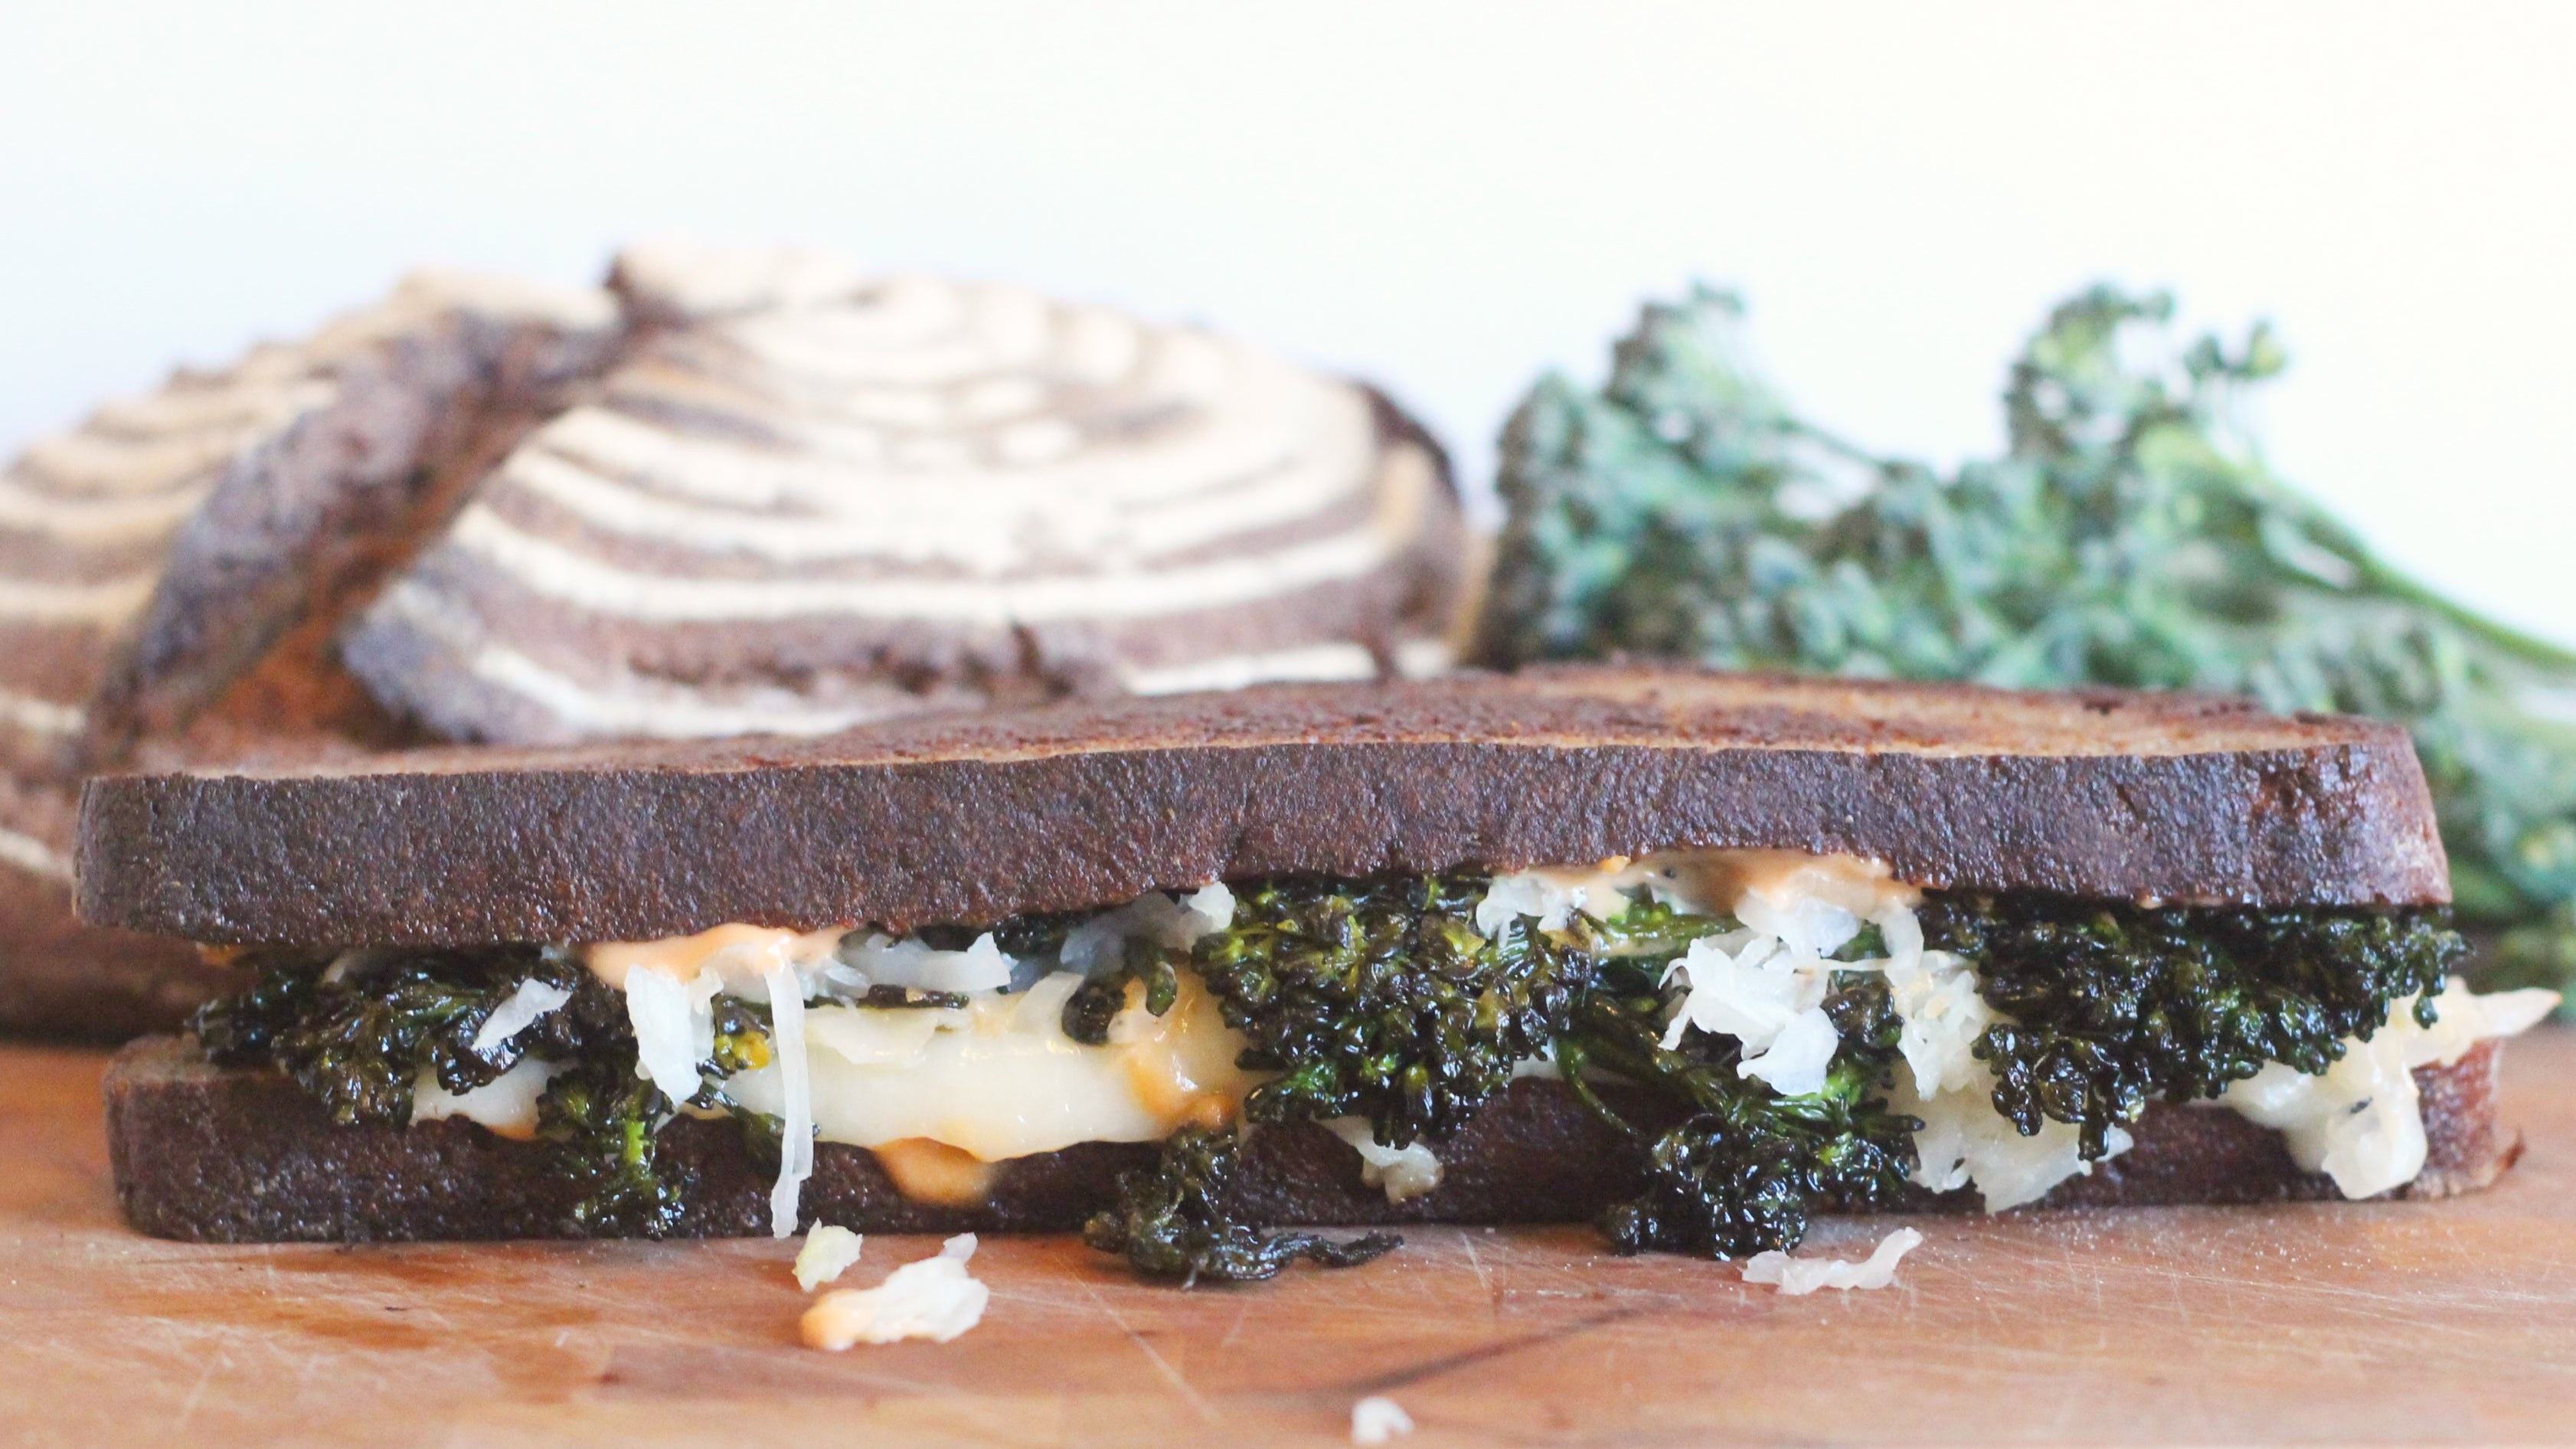 Make Any Veggie Sandwich Better By Treating It Like A Grilled Sandwich